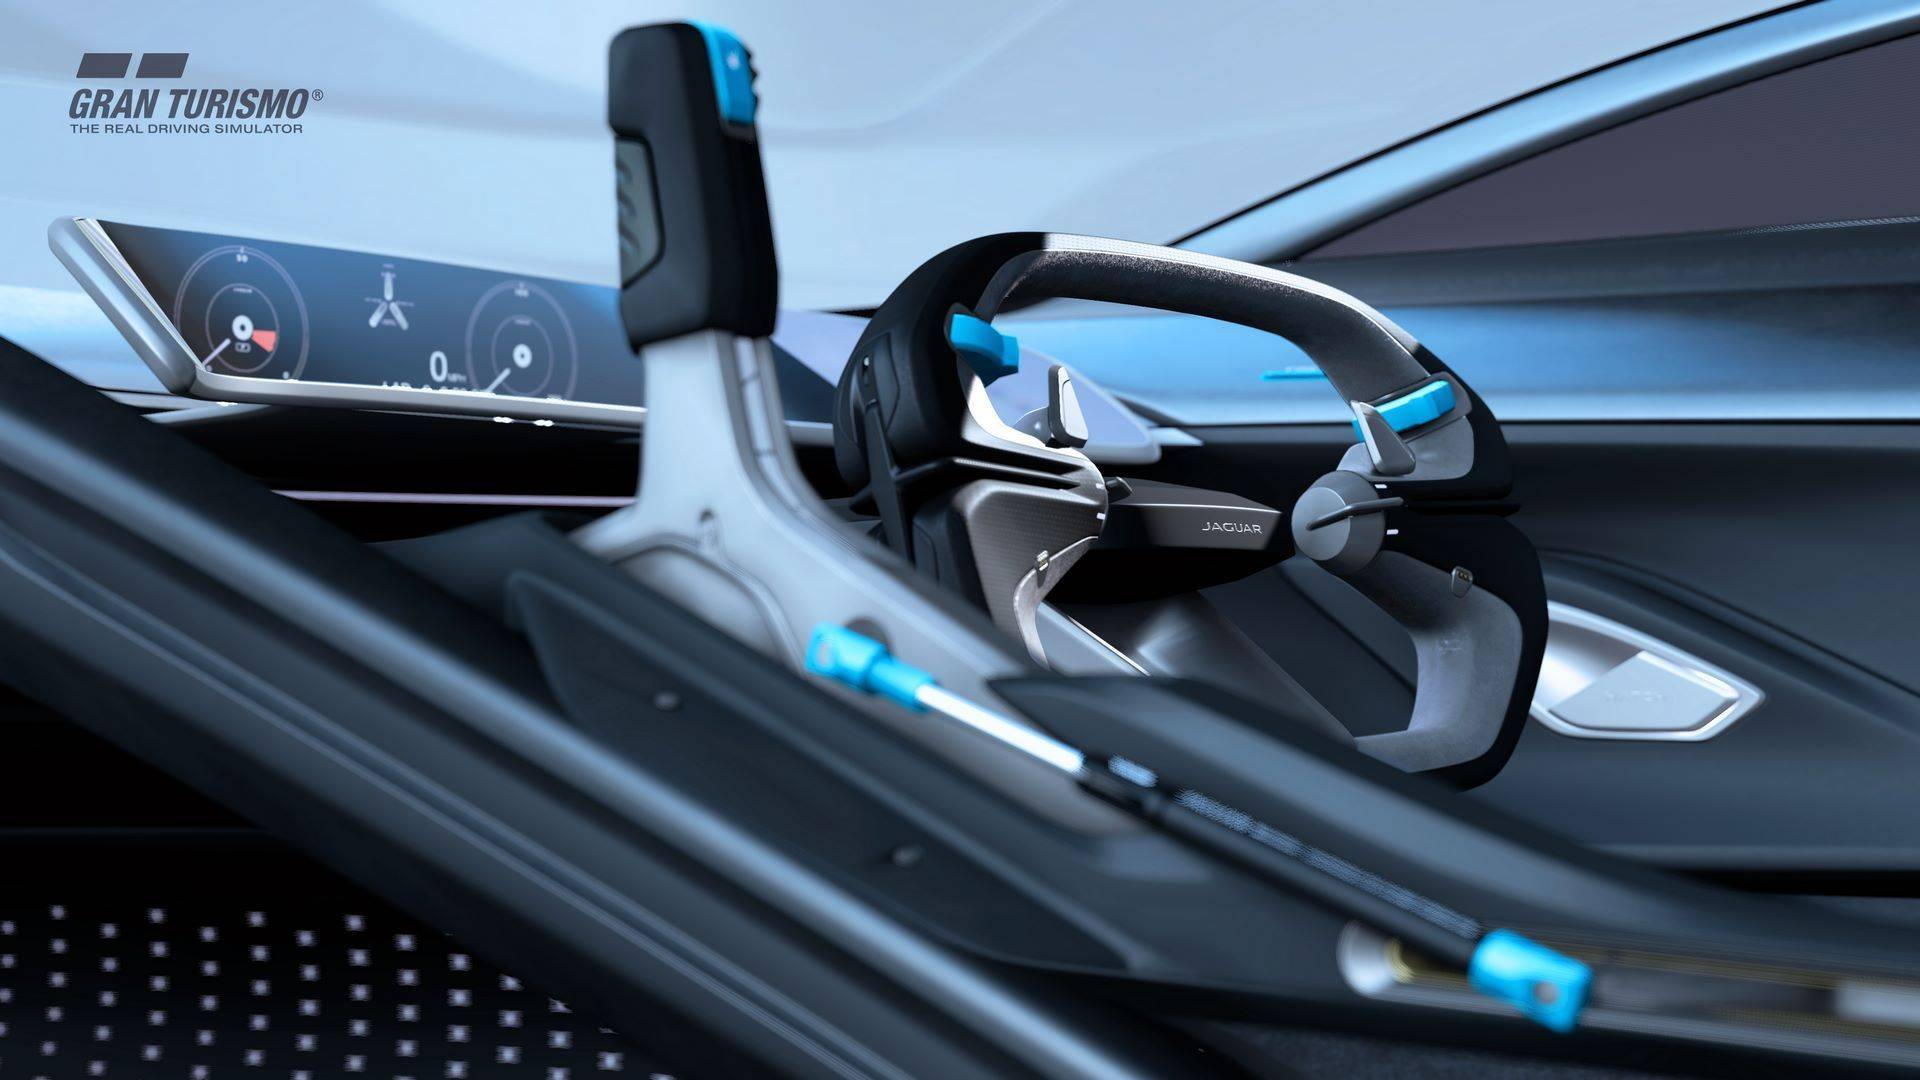 Jaguar-Vision-Gran-Turismo-SV-17